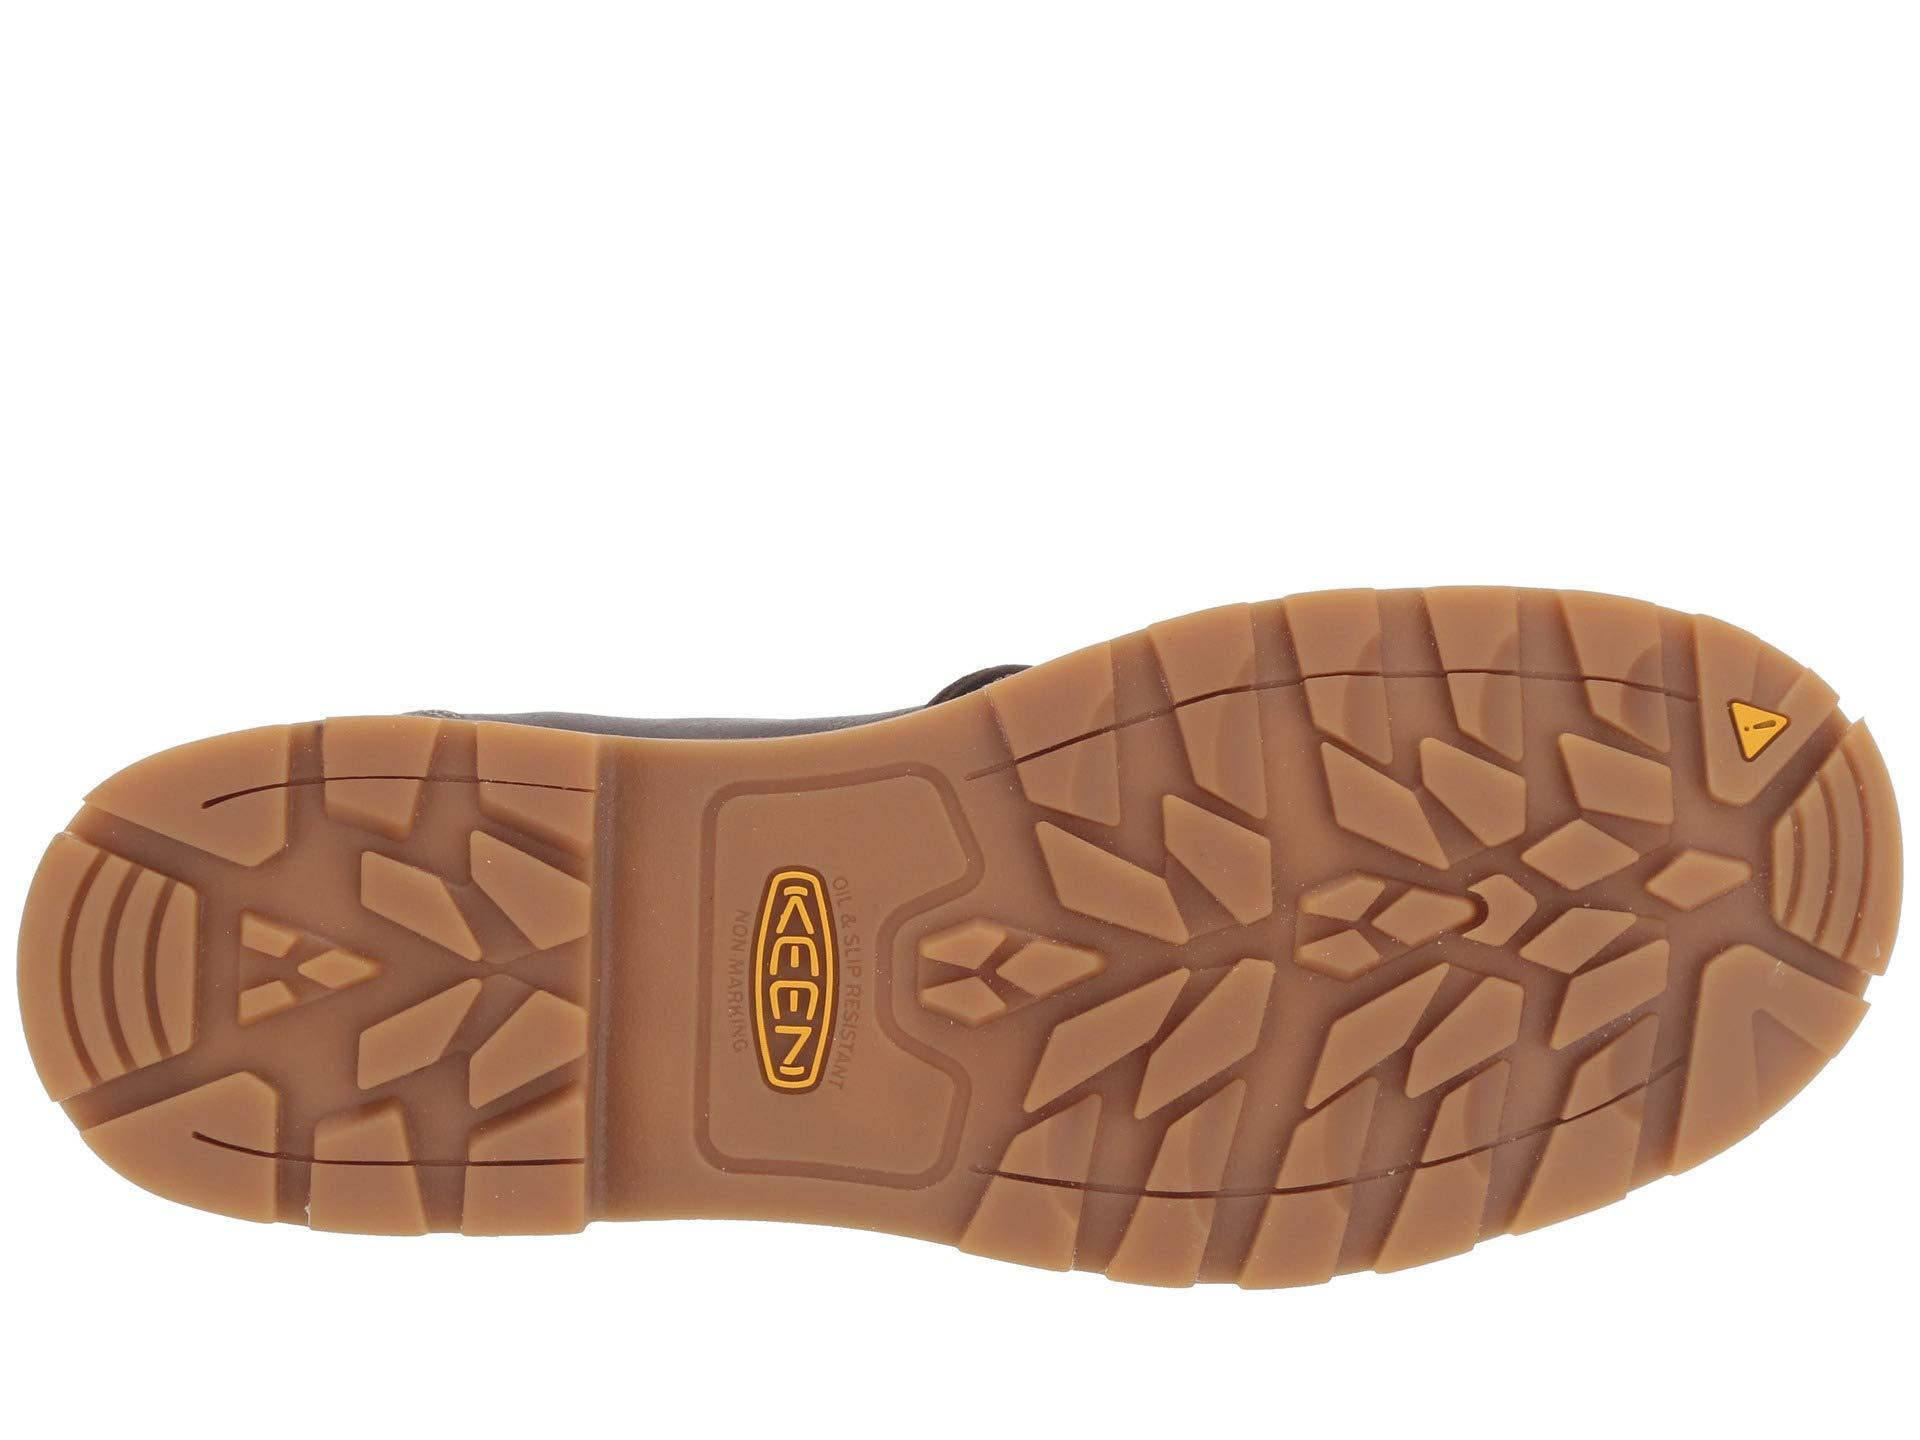 e8adcfb491d5 ... Seattle Romeo Aluminum Toe (cascade Brown gum) Men s Work Boots. View  fullscreen